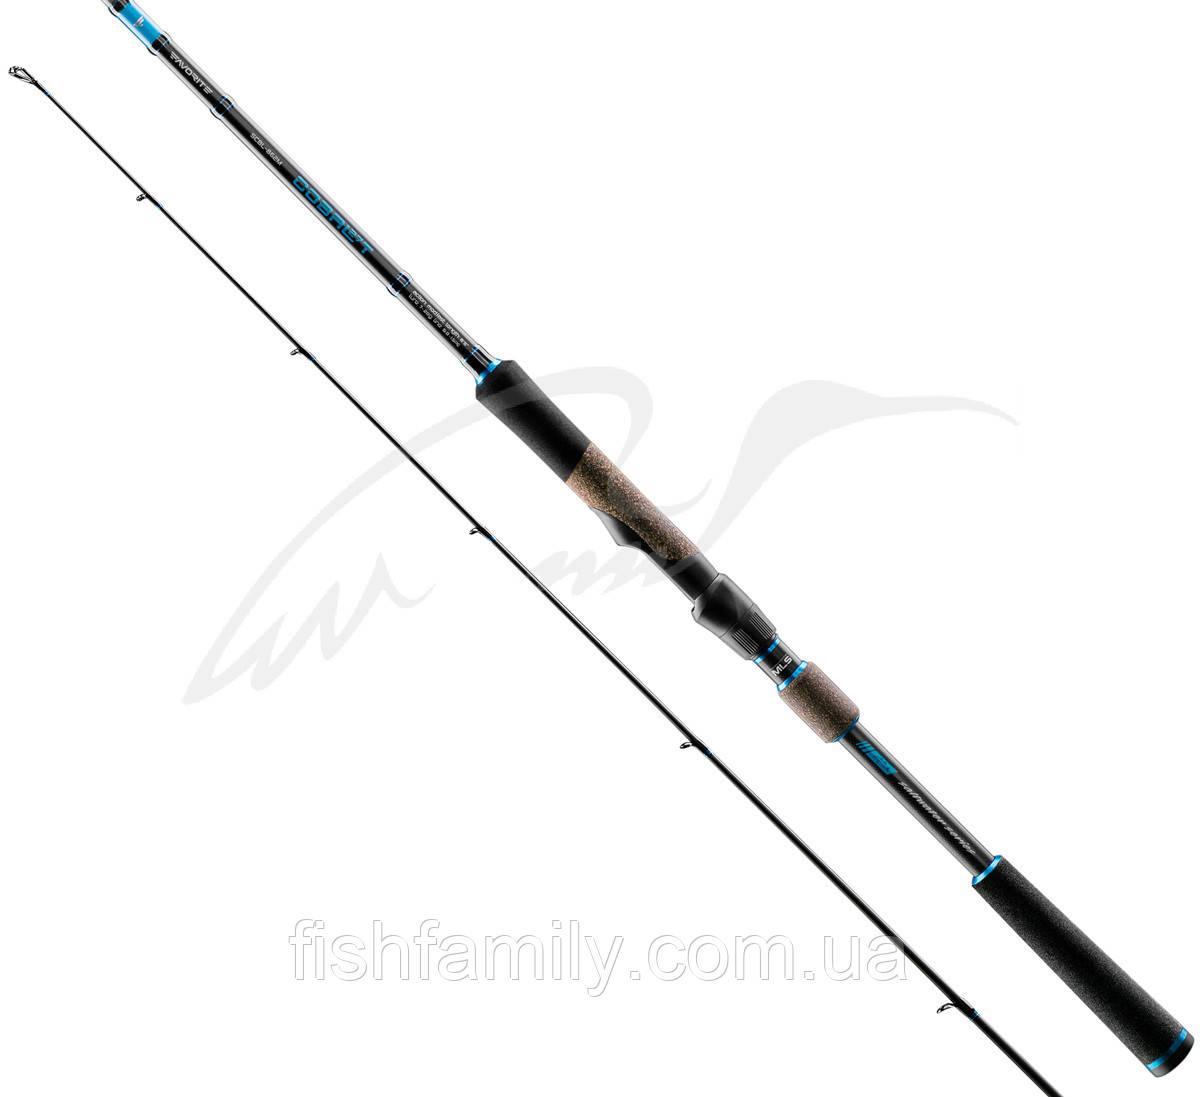 Спінінг Favorite SW Cobalt SCBL-902MH 2.74 m 10-35g PE #1.0-2.0 Mod.Fast